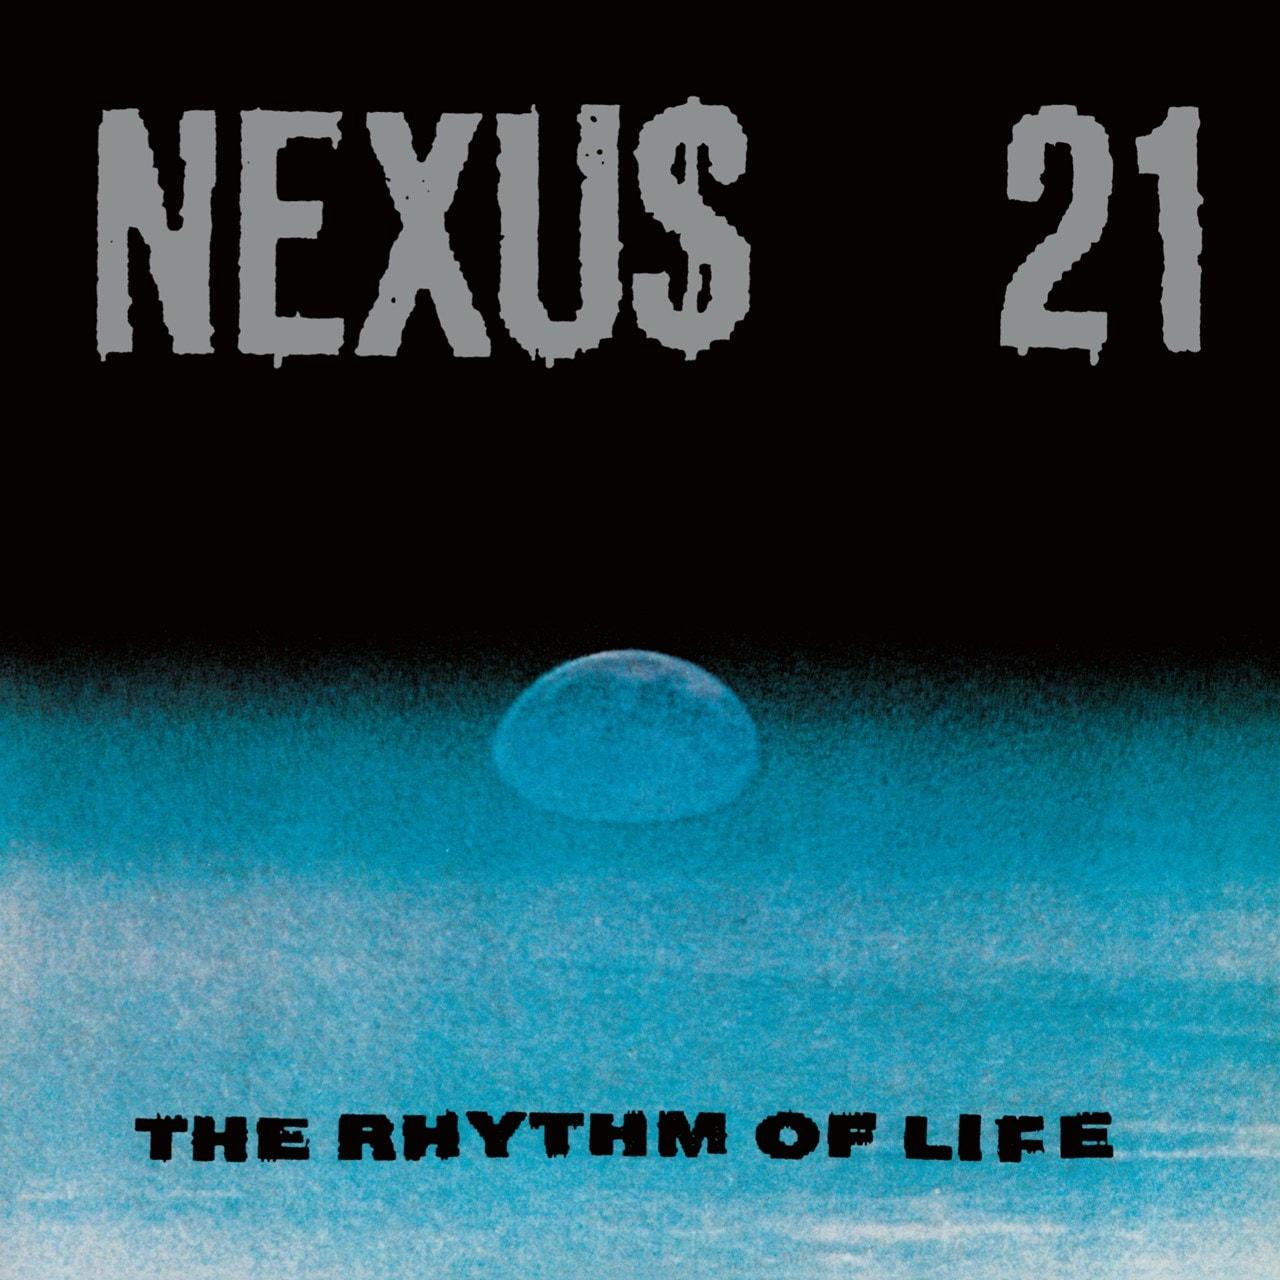 The Rhythm of Life - 1